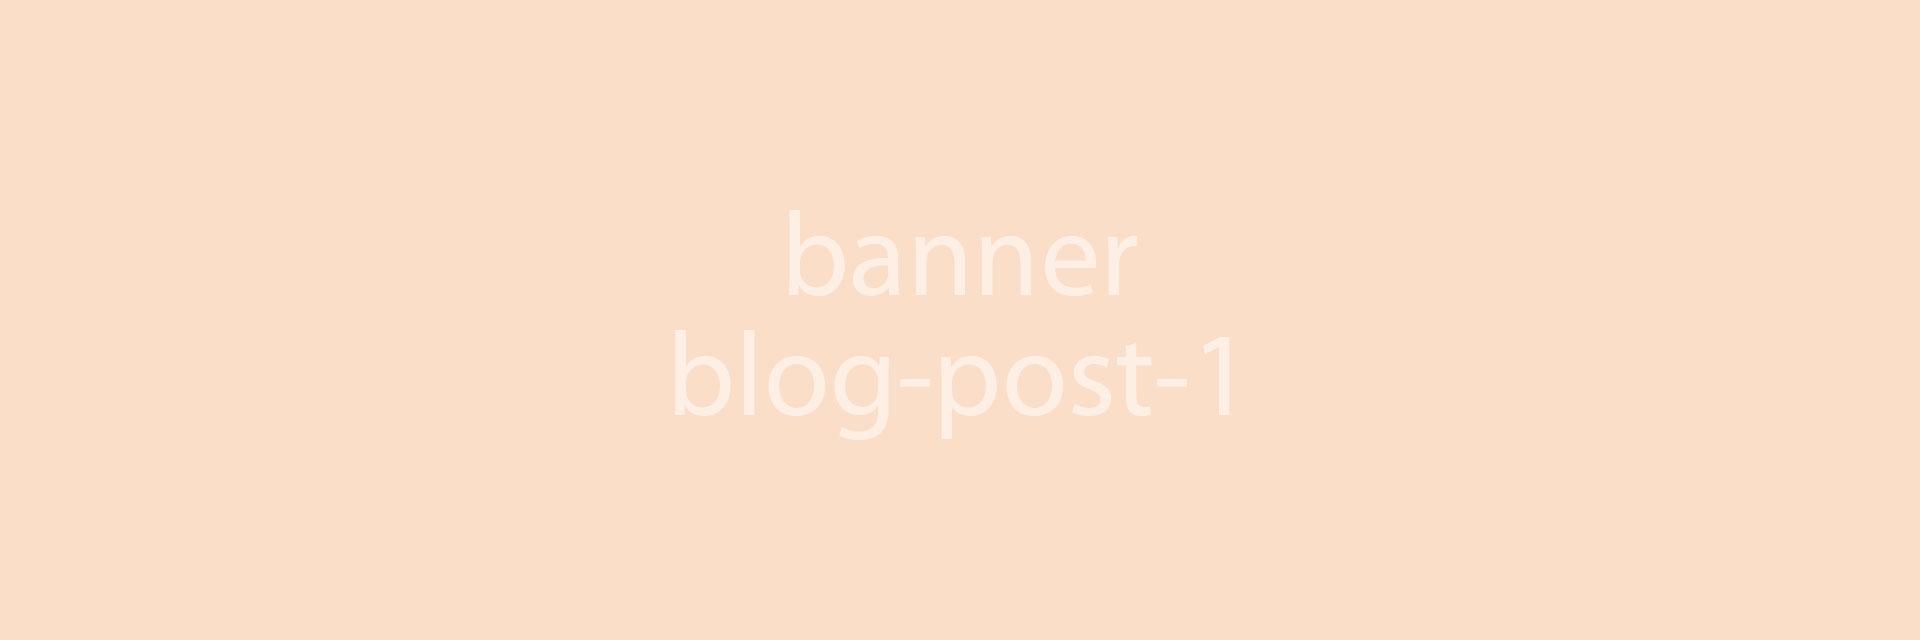 Blog Post 1